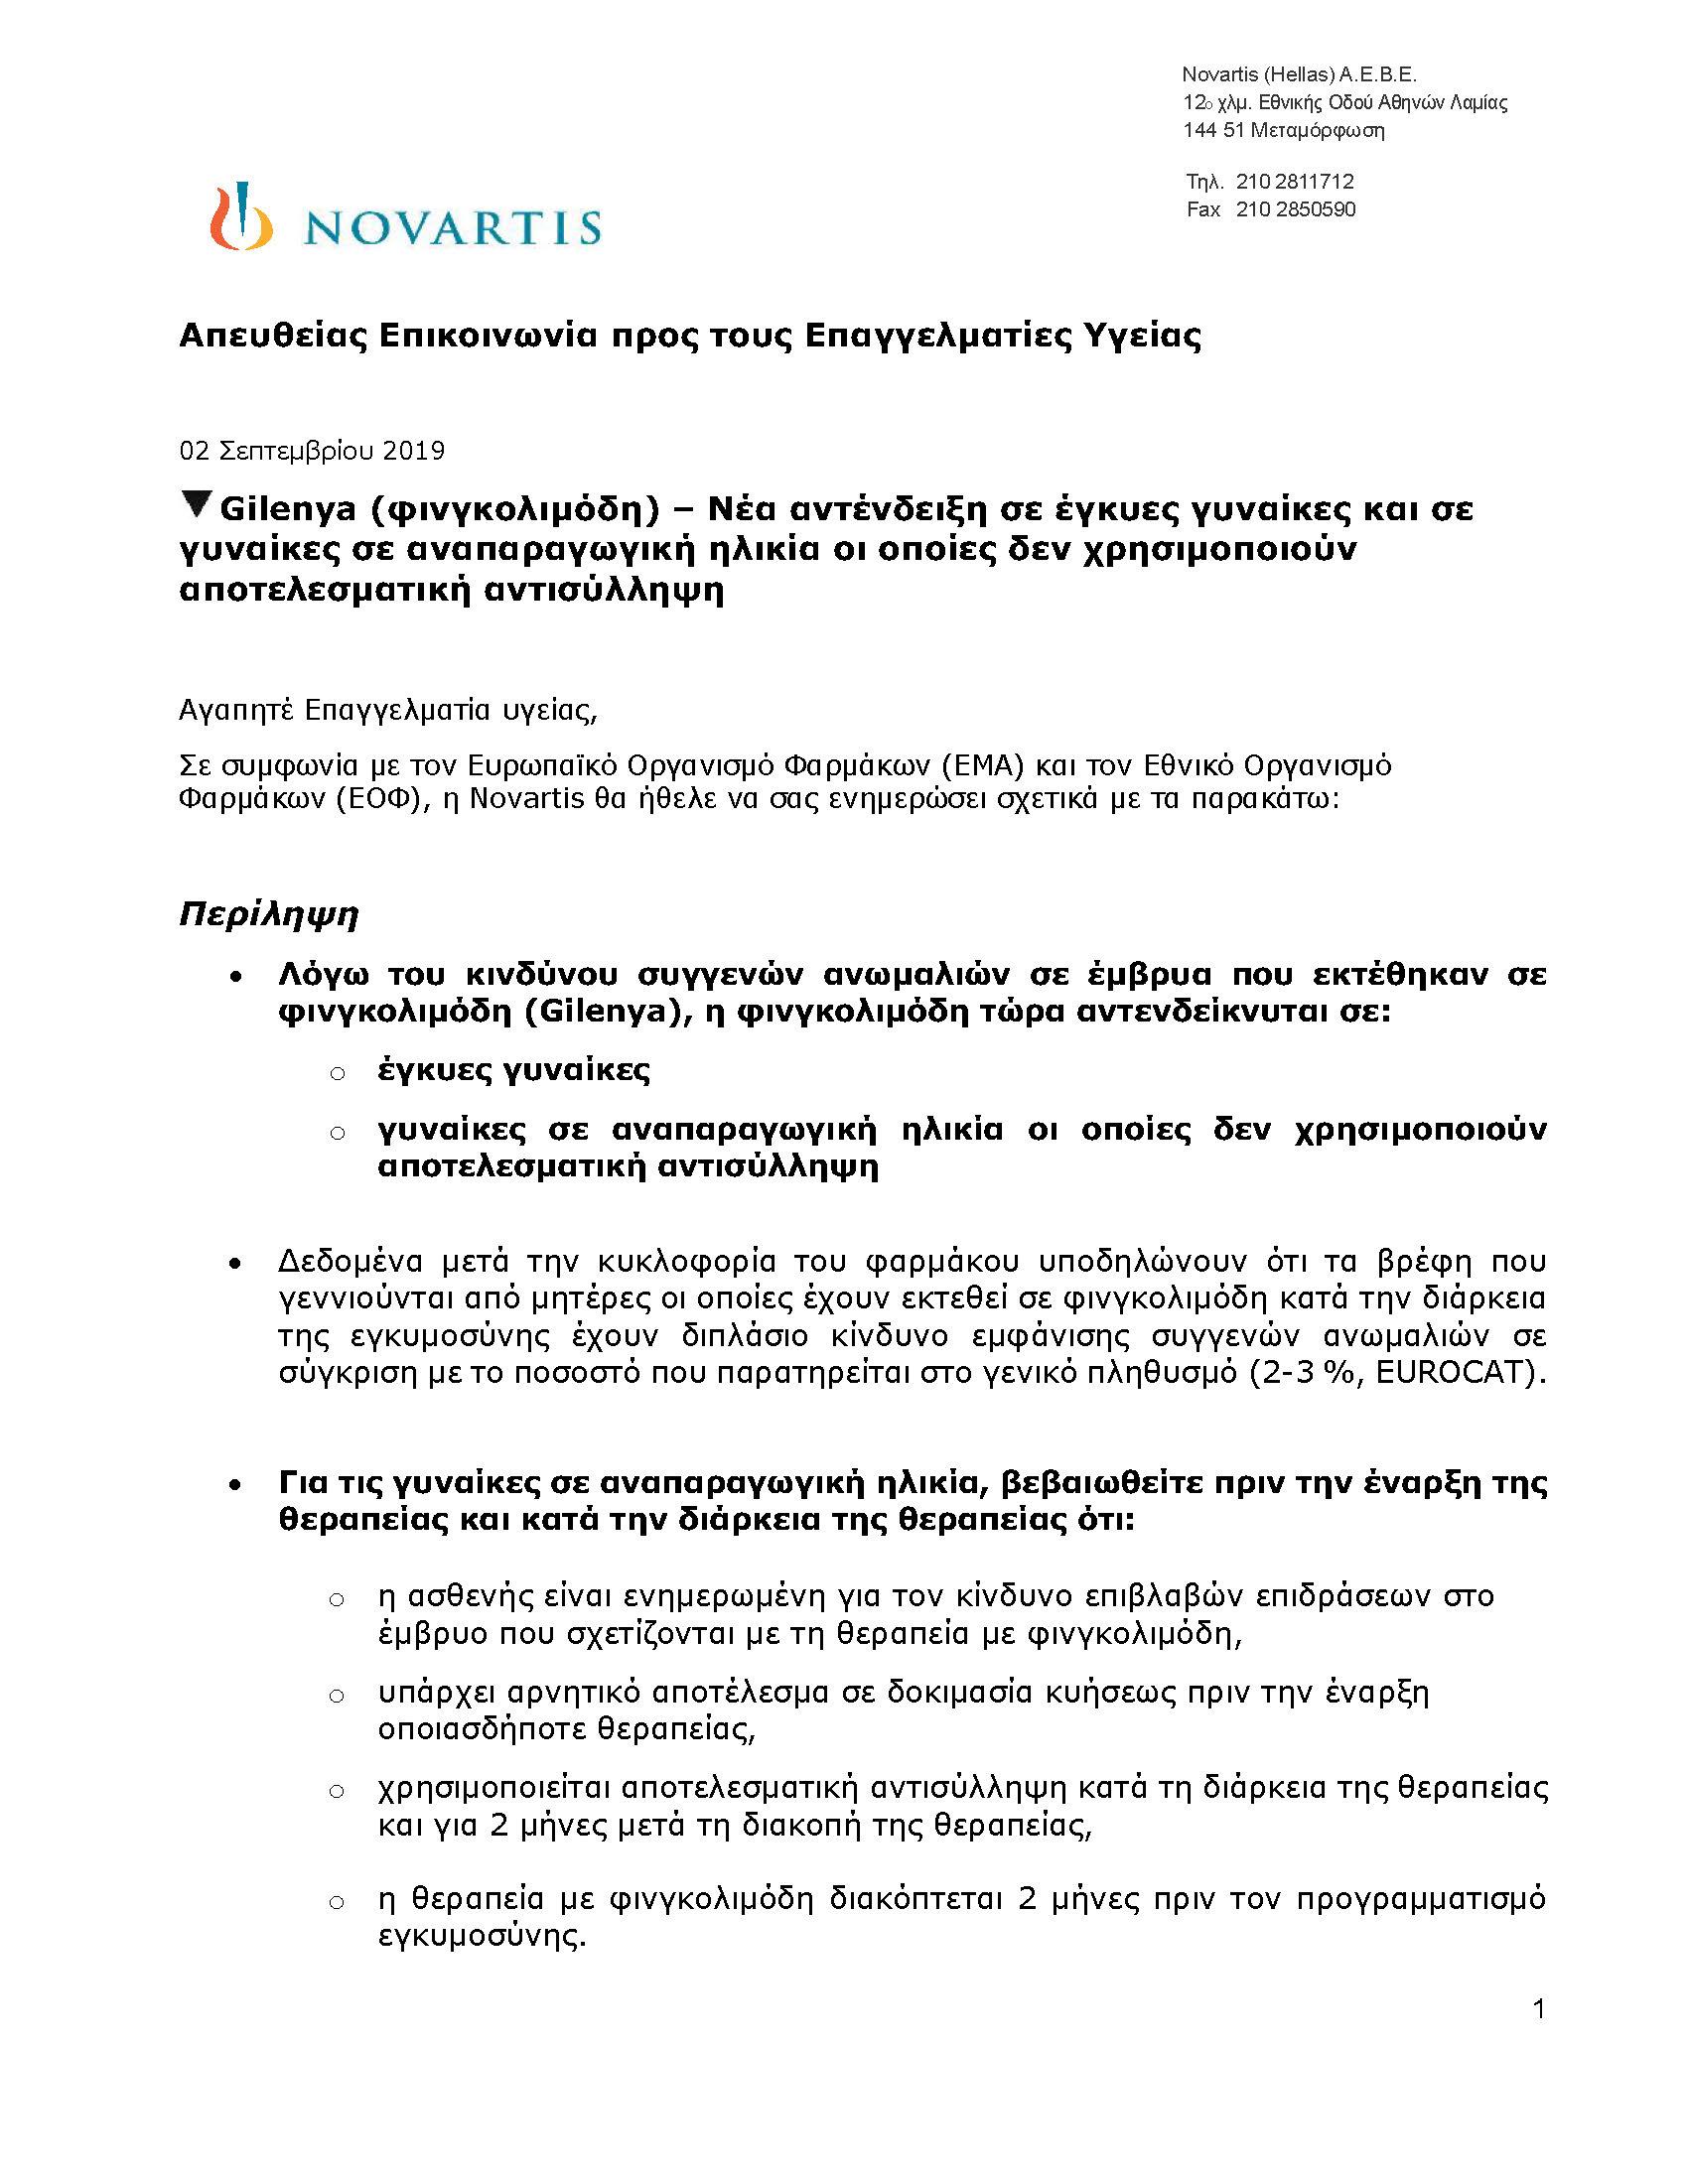 Gilenya II-53 -DHPC letter_02Sep19_final (002)_Page_1